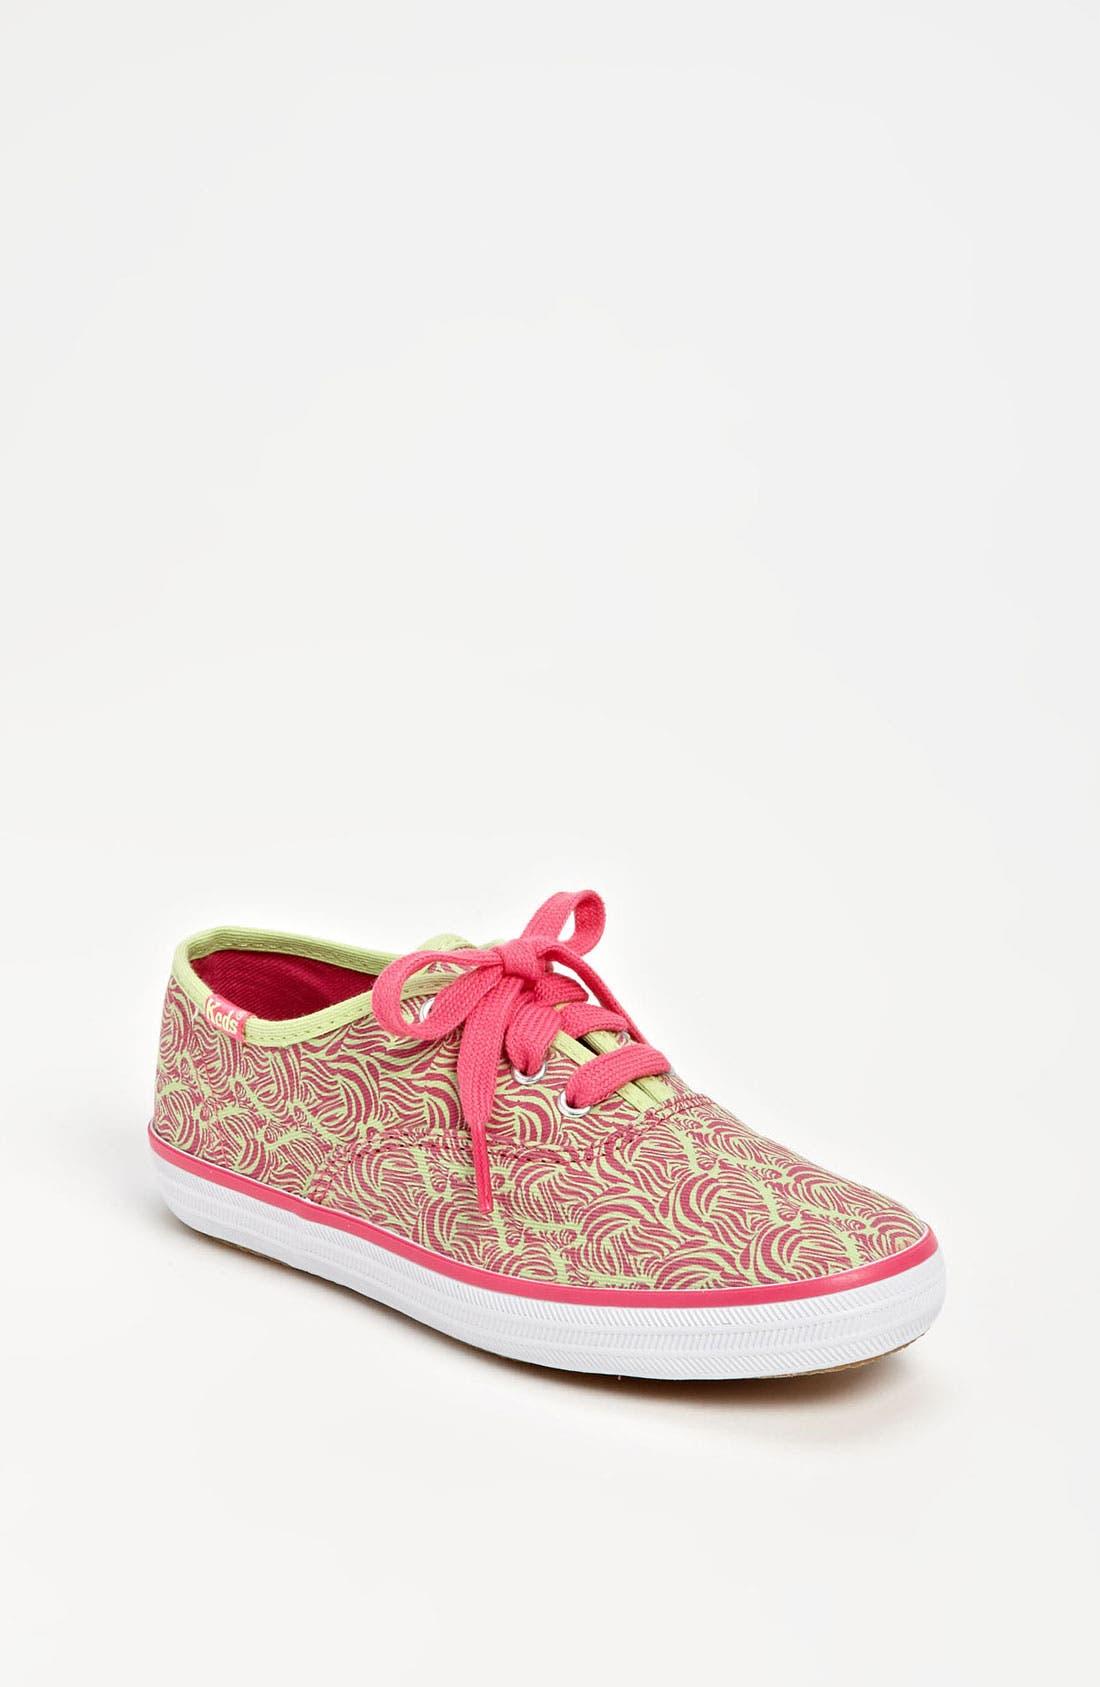 Alternate Image 1 Selected - Keds® 'Original Champion' Sneaker (Toddler, Little Kid & Big Kid)